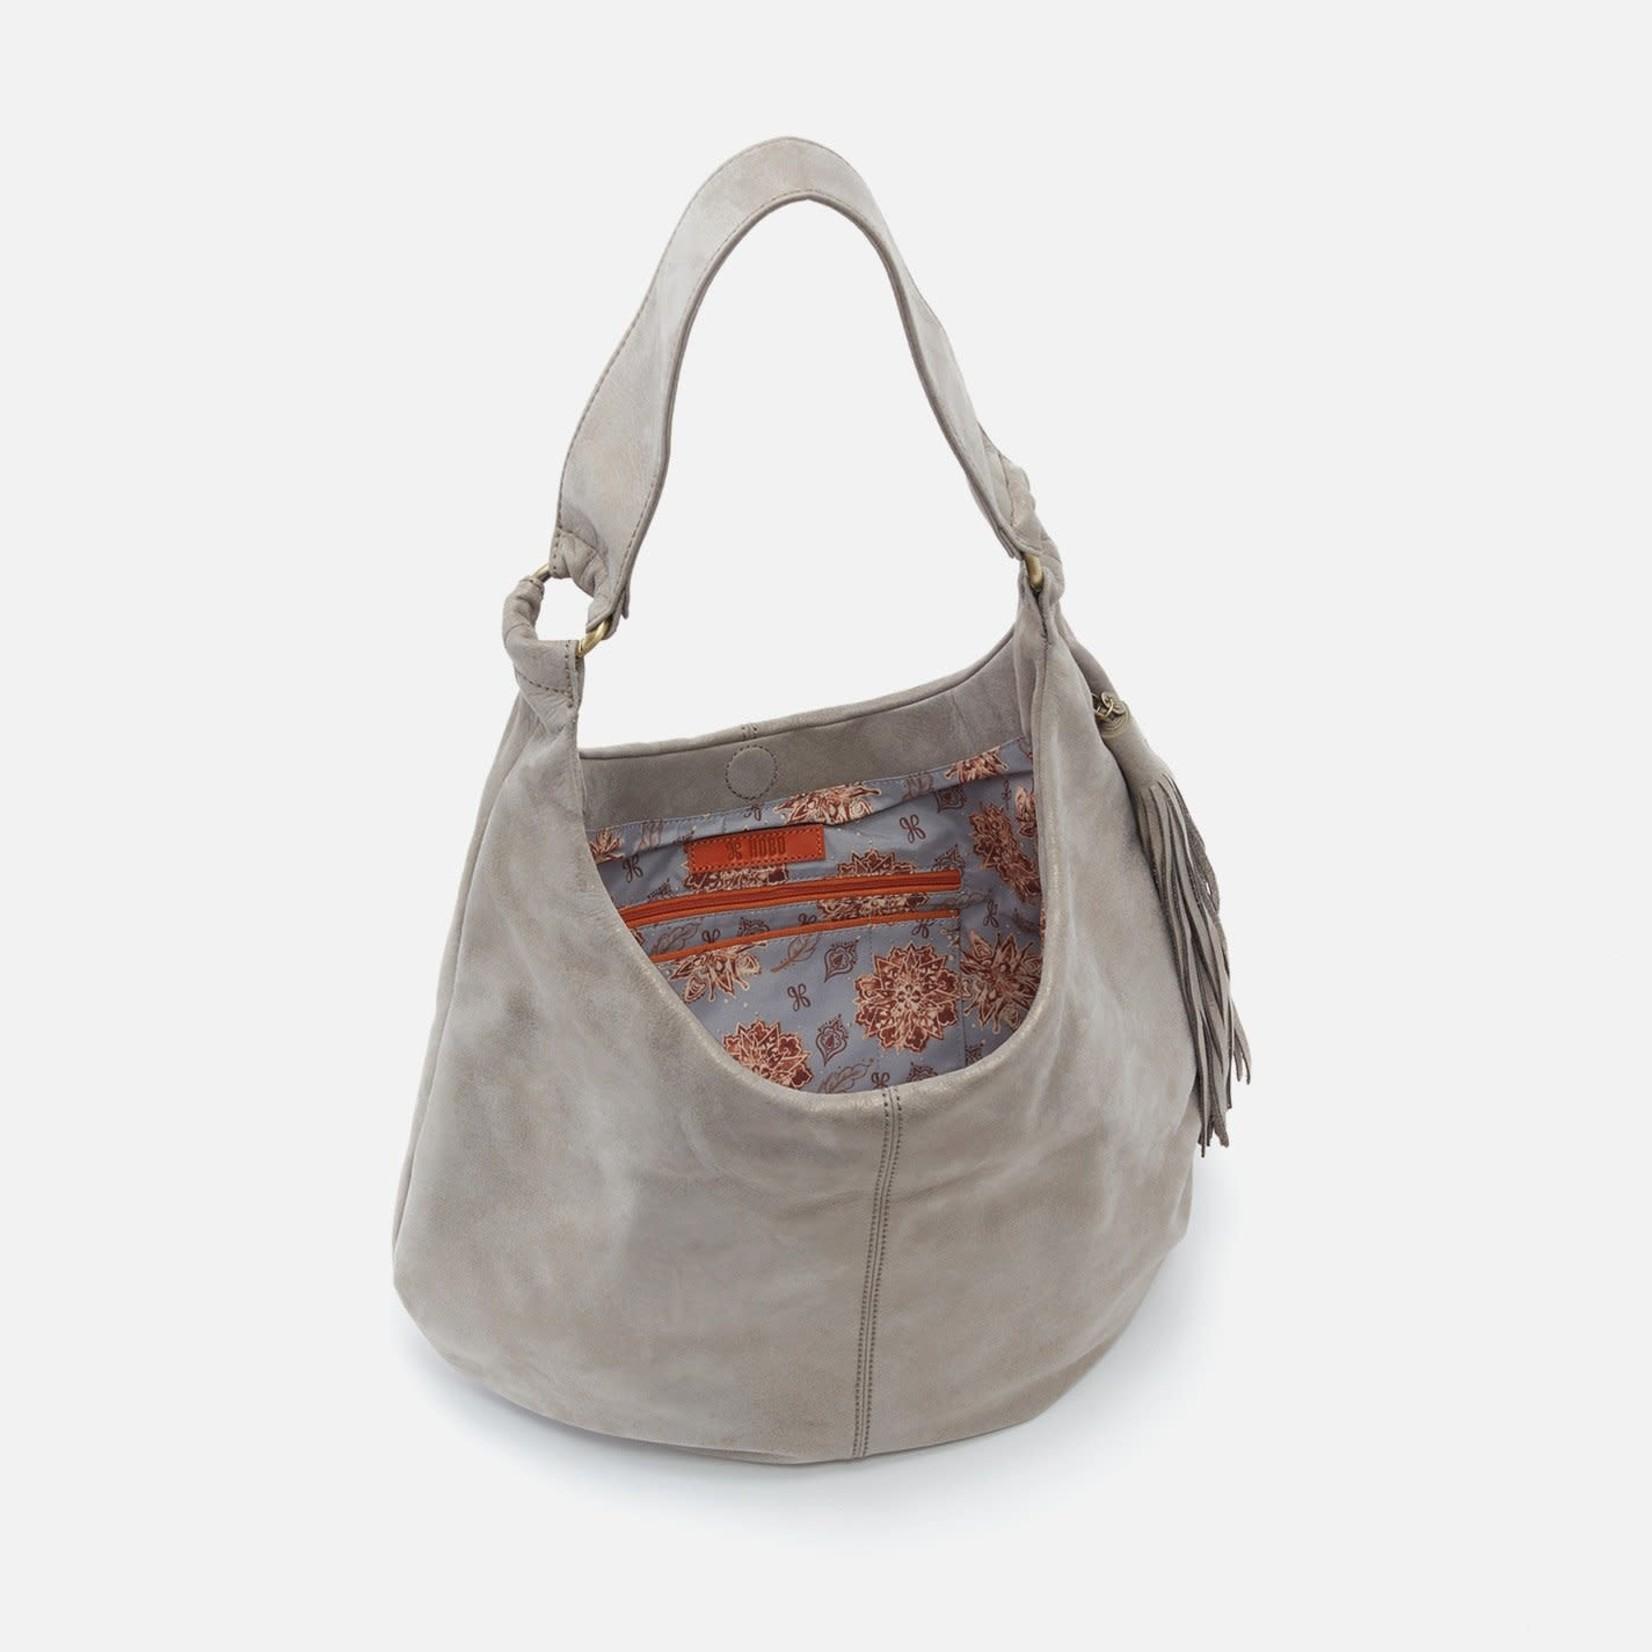 HOBO Gardner Granite Gold Leather Hobo Bag